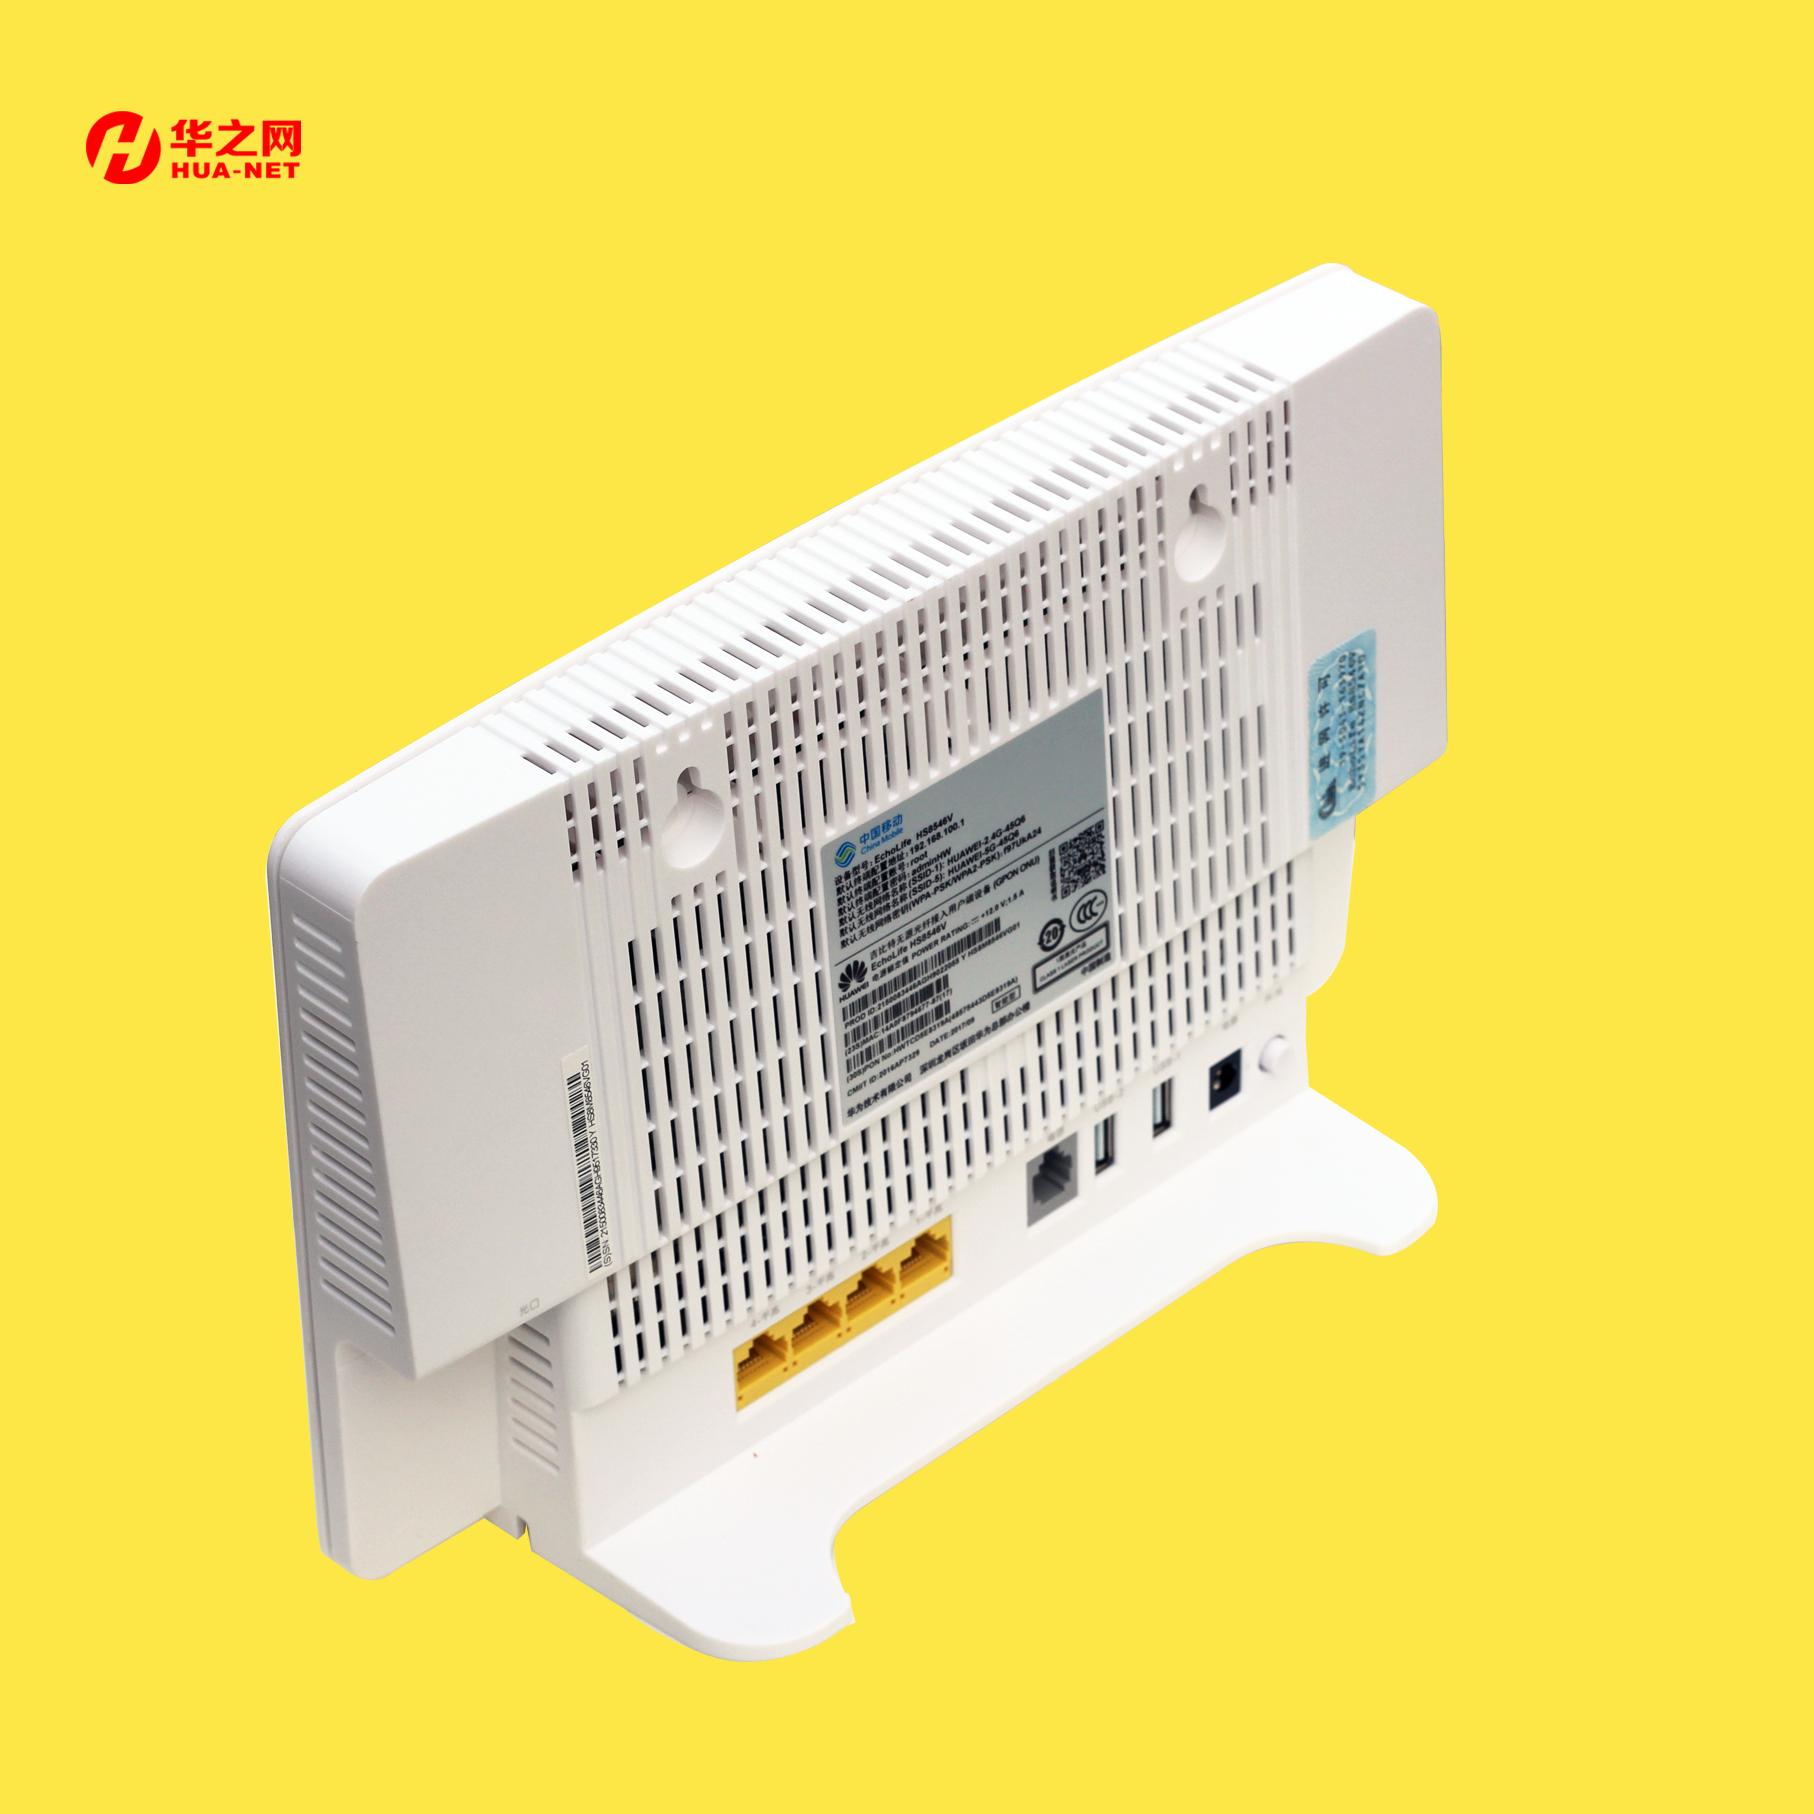 Huawei HS8546V GPON ONU ONT HGU Dual Band Router 4GE+Wifi2 4GHz /5GHz Same  Function as Huawei HG8245H